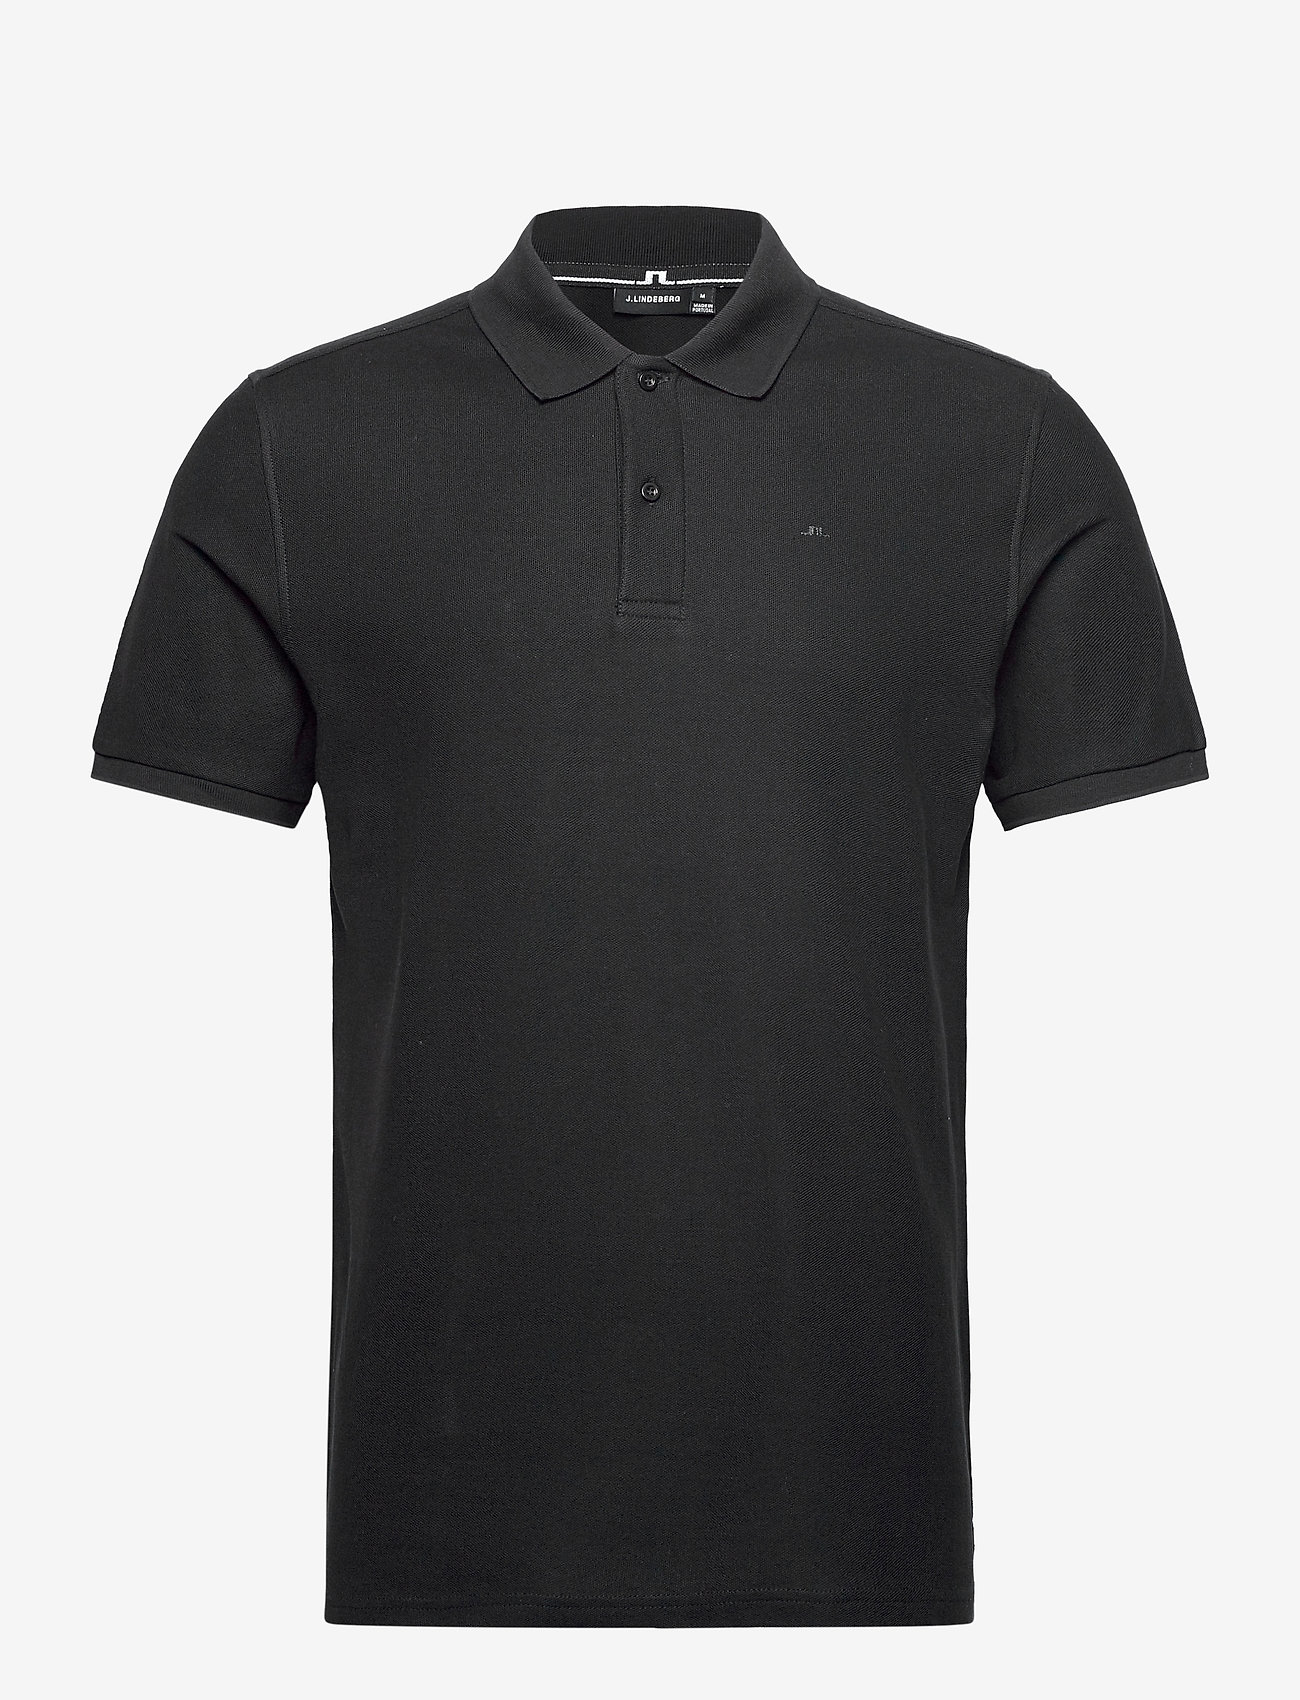 J. Lindeberg - Troy ST Pique Polo Shirt - kurzärmelig - black - 0